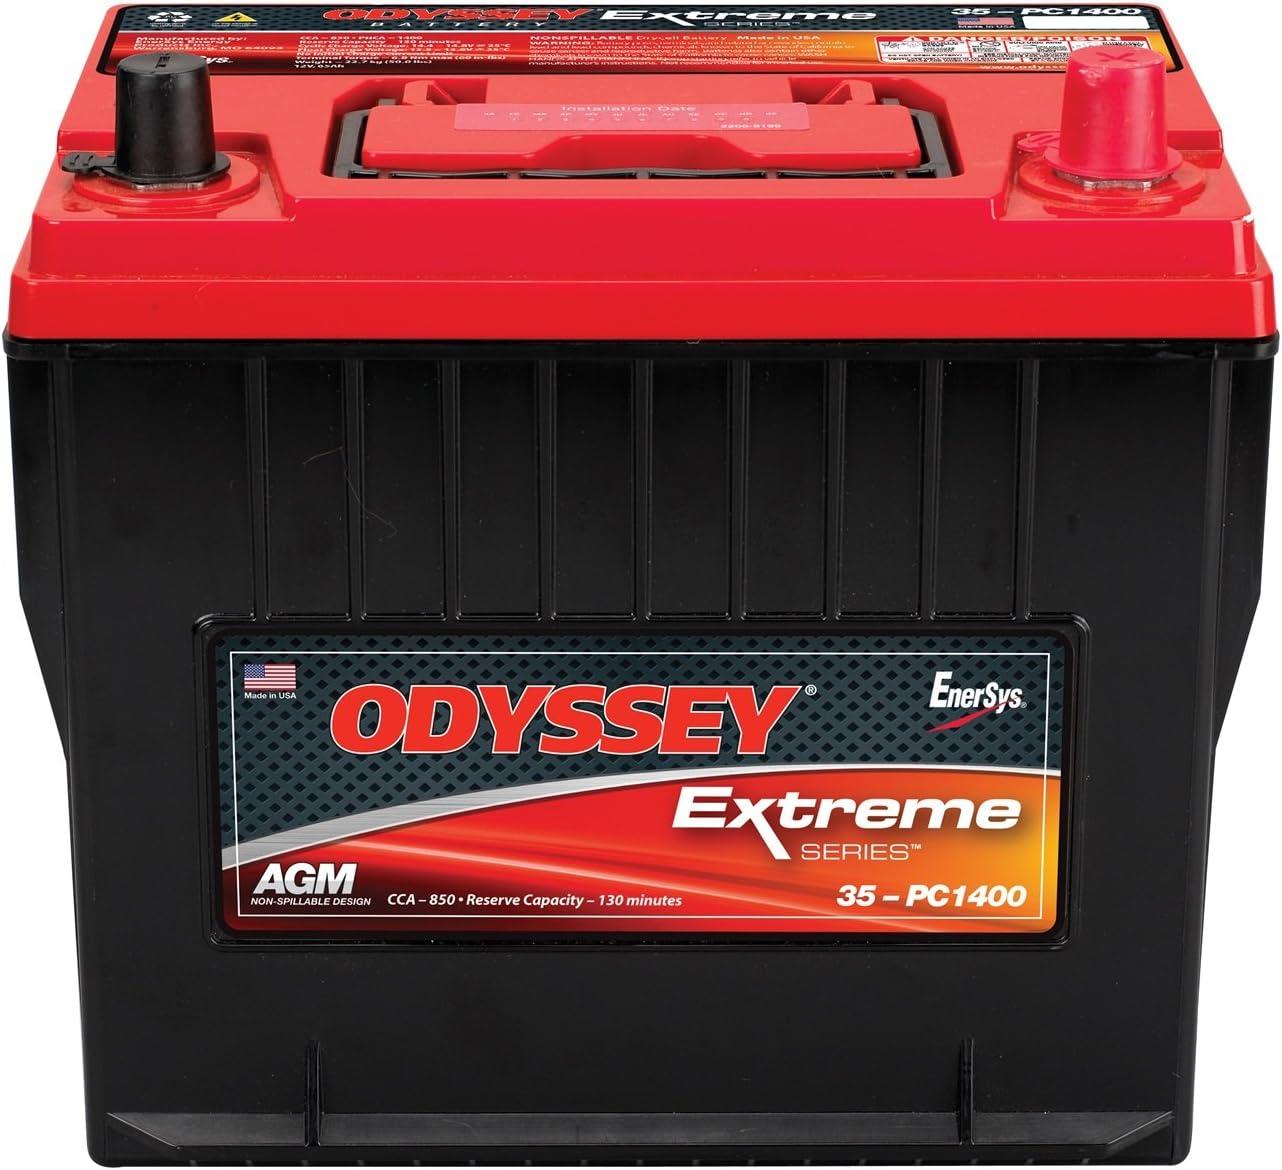 850 CCA Batteries